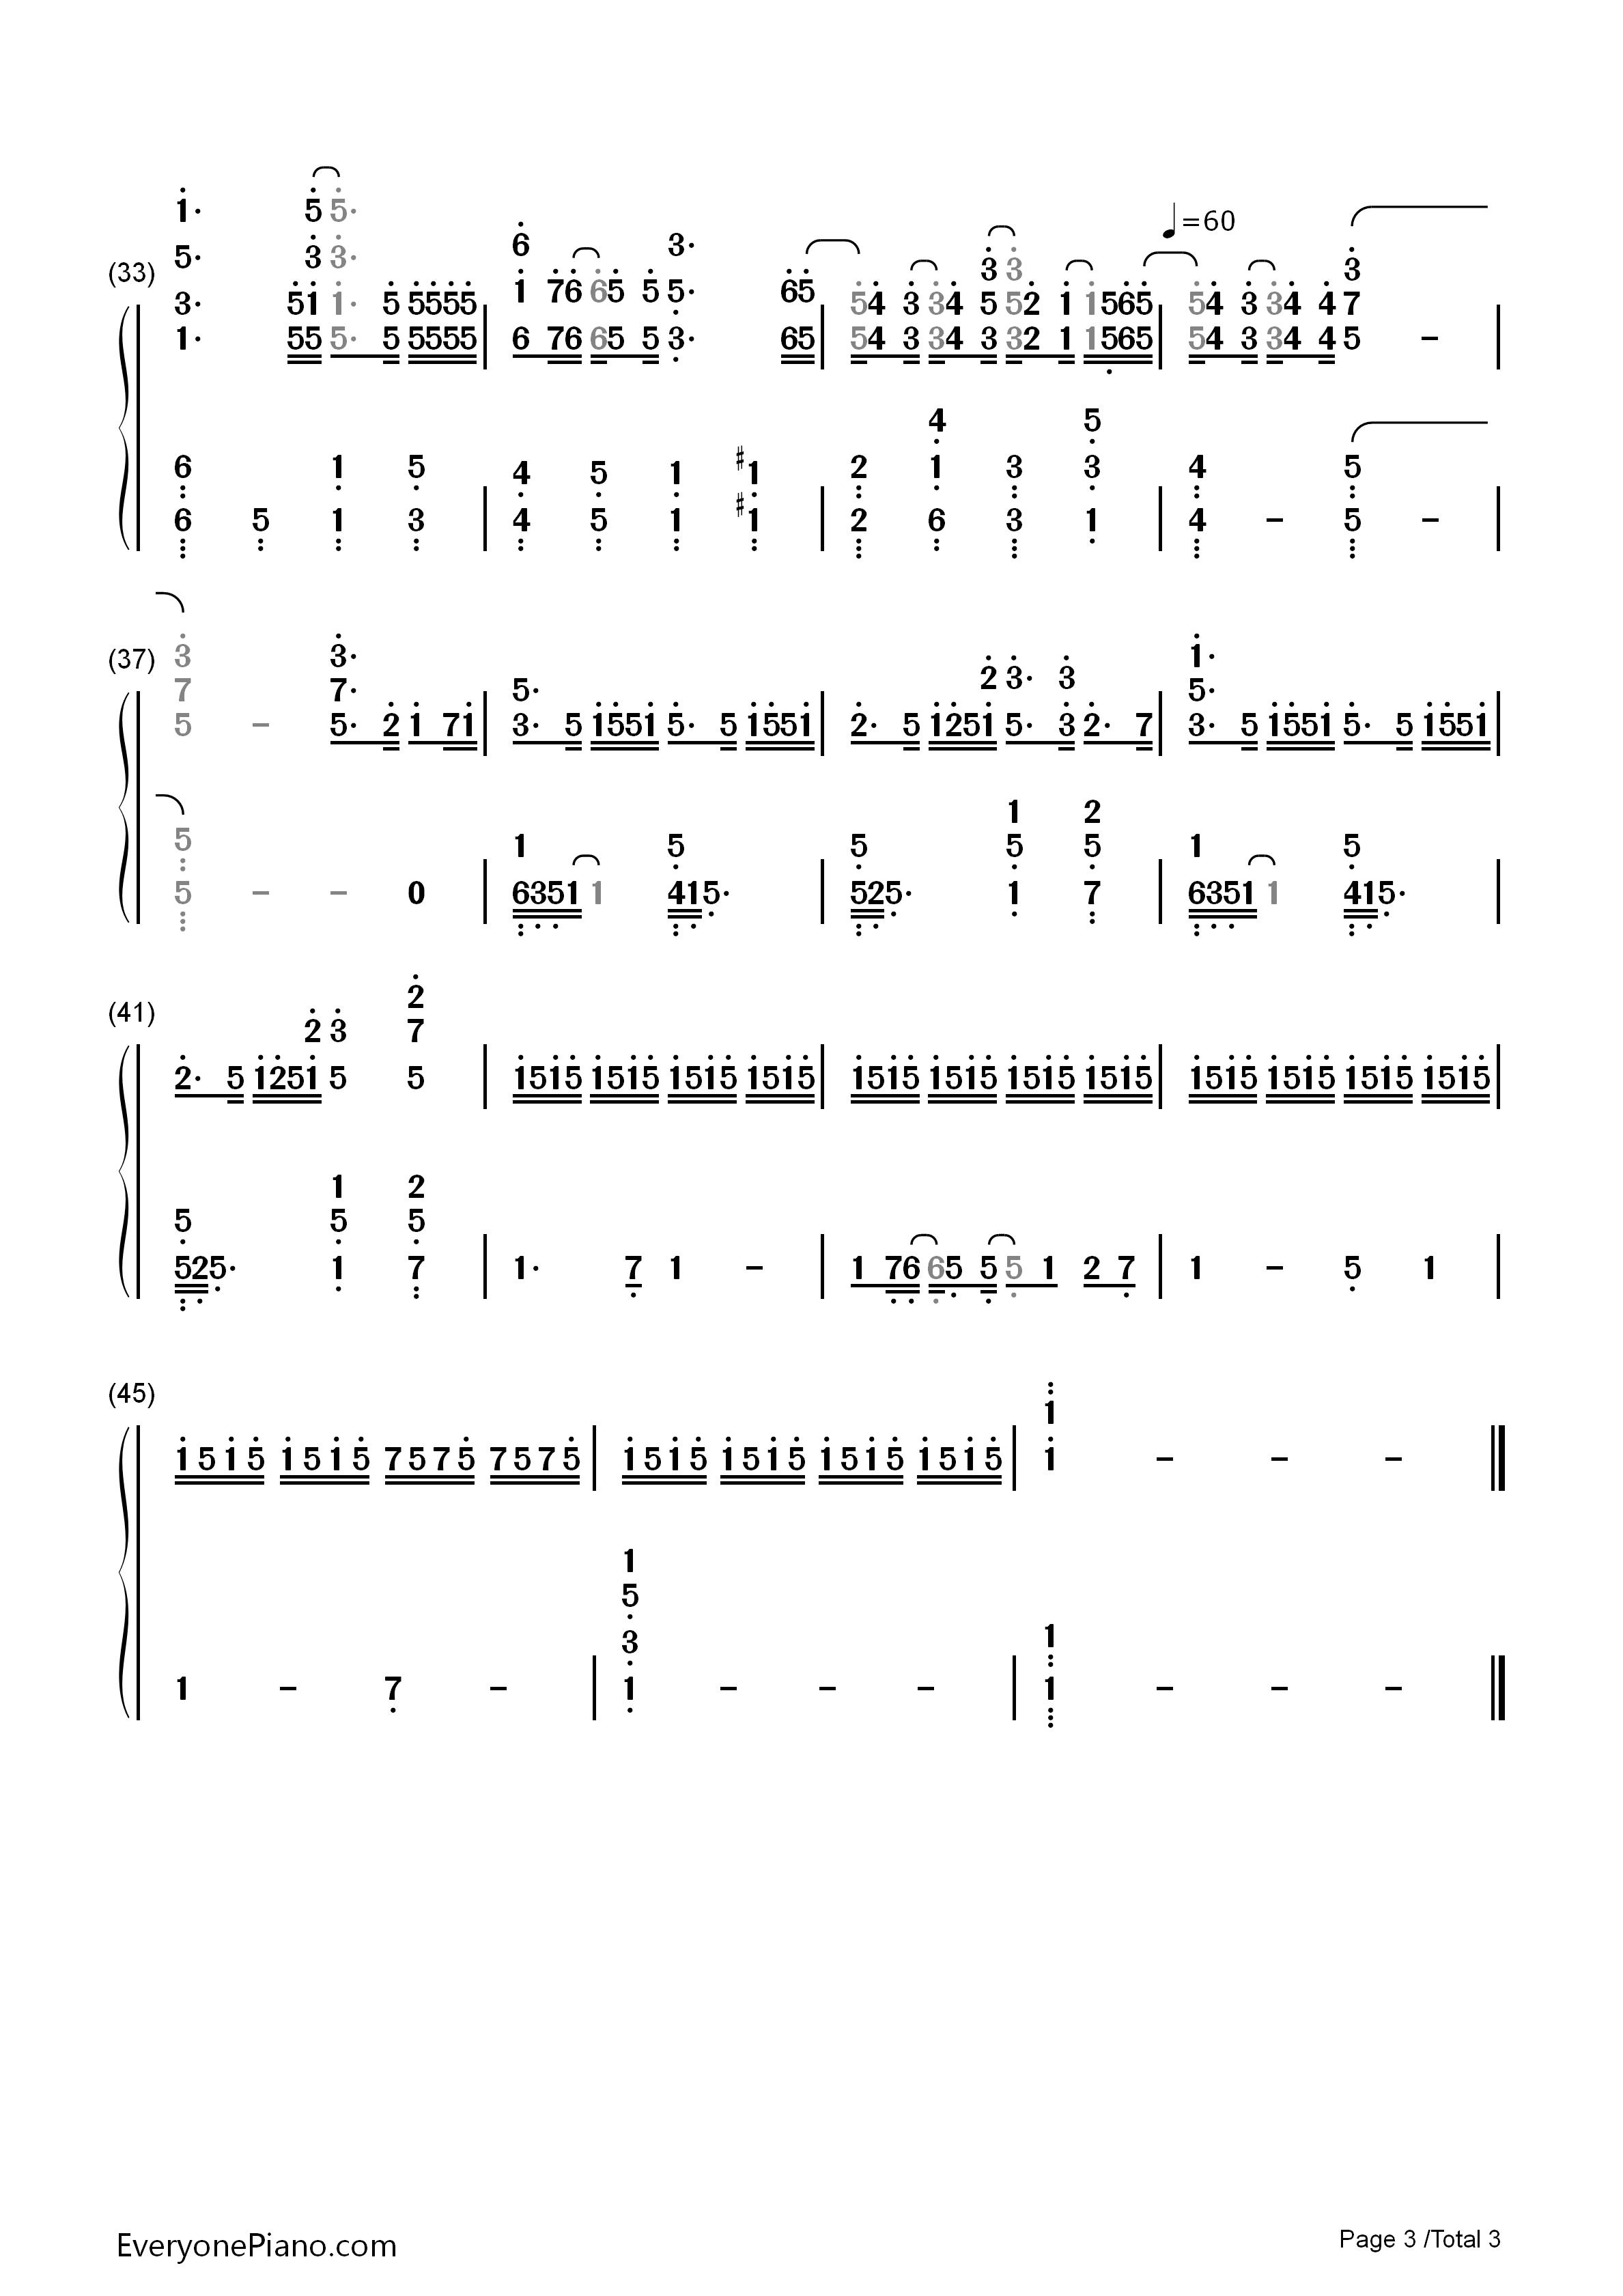 planetes-罪恶王冠:失落的圣诞节ova主题歌双手简谱3